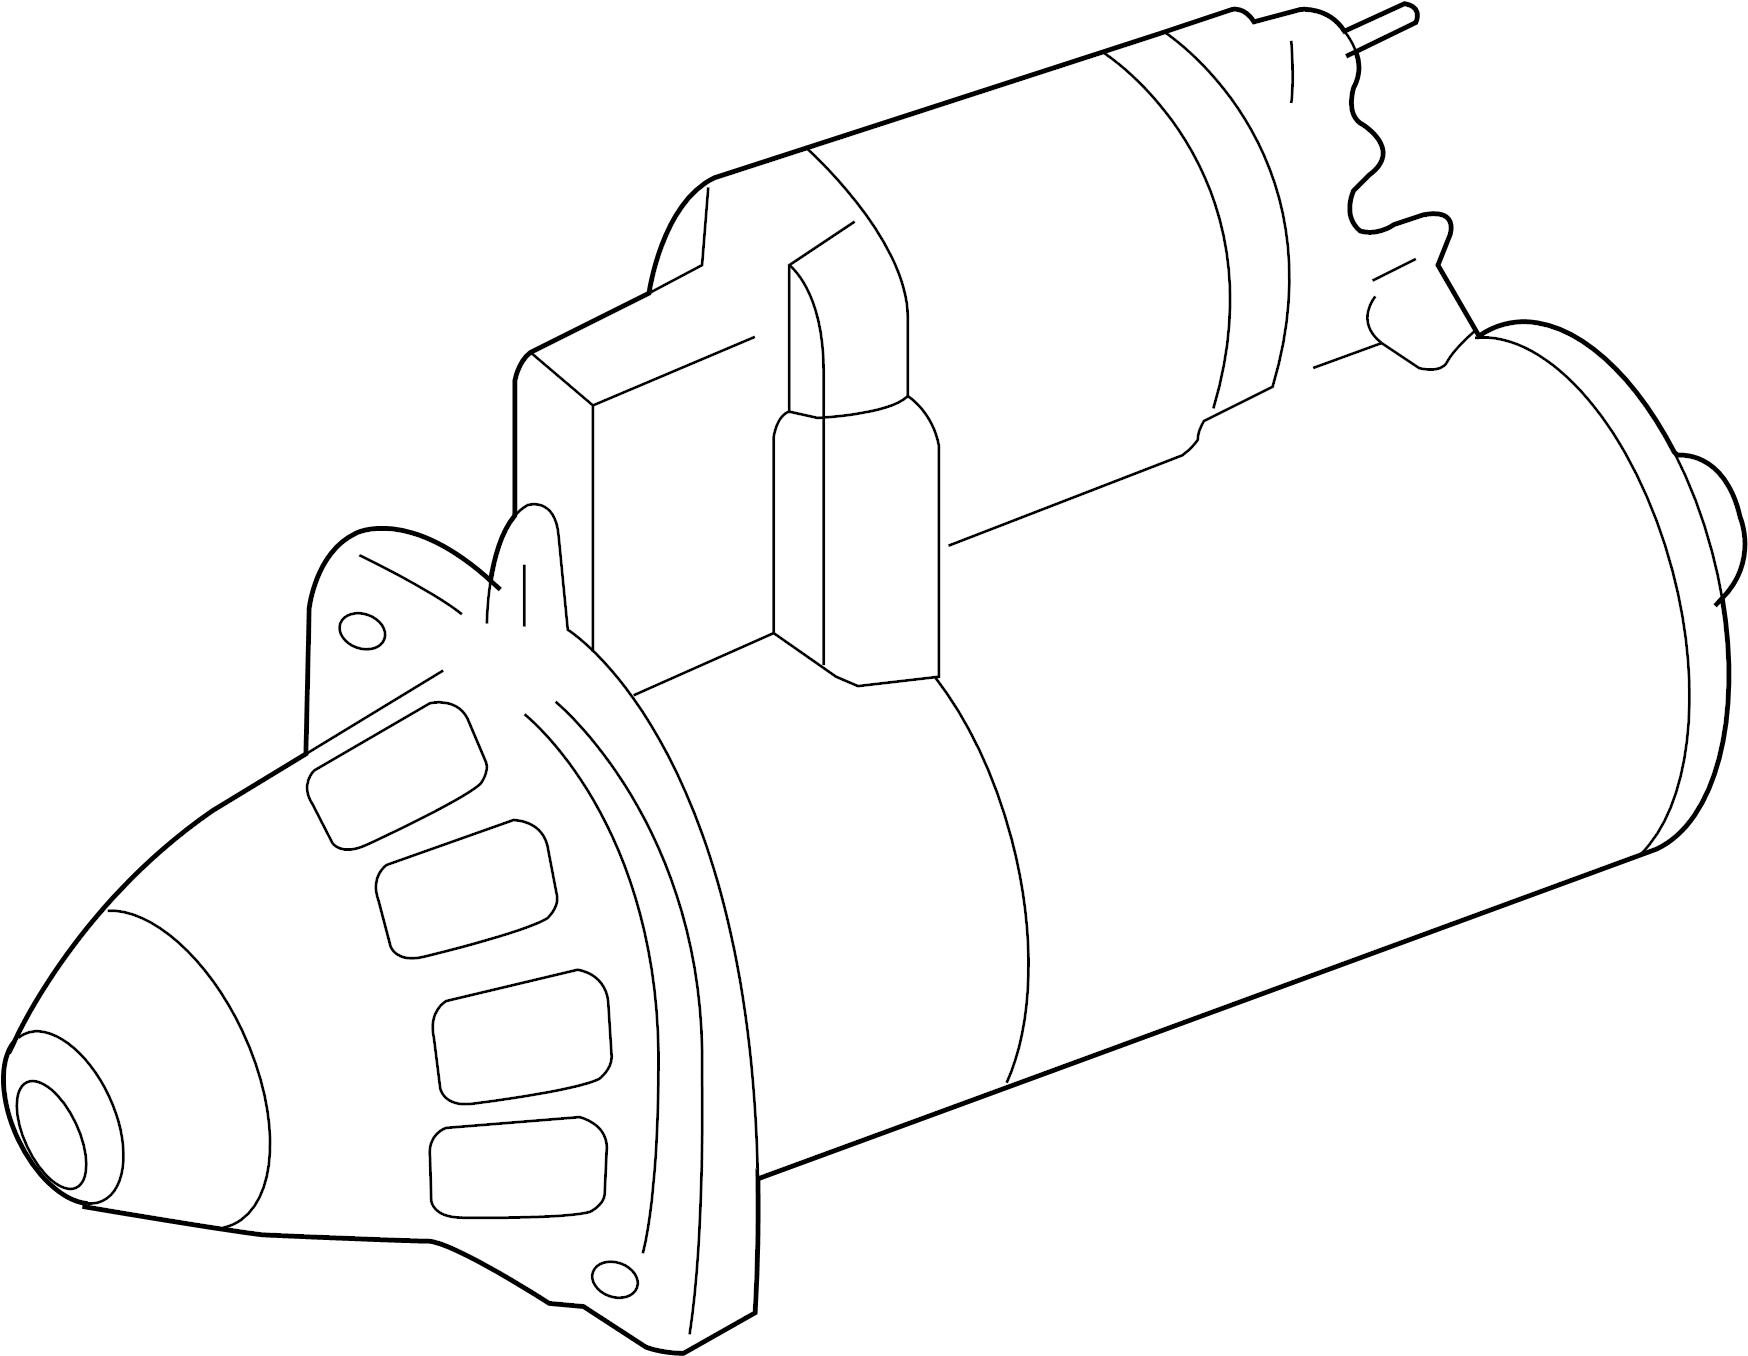 2009 Volkswagen Jetta GLI Starter Motor. 2.0 Kw. Includes